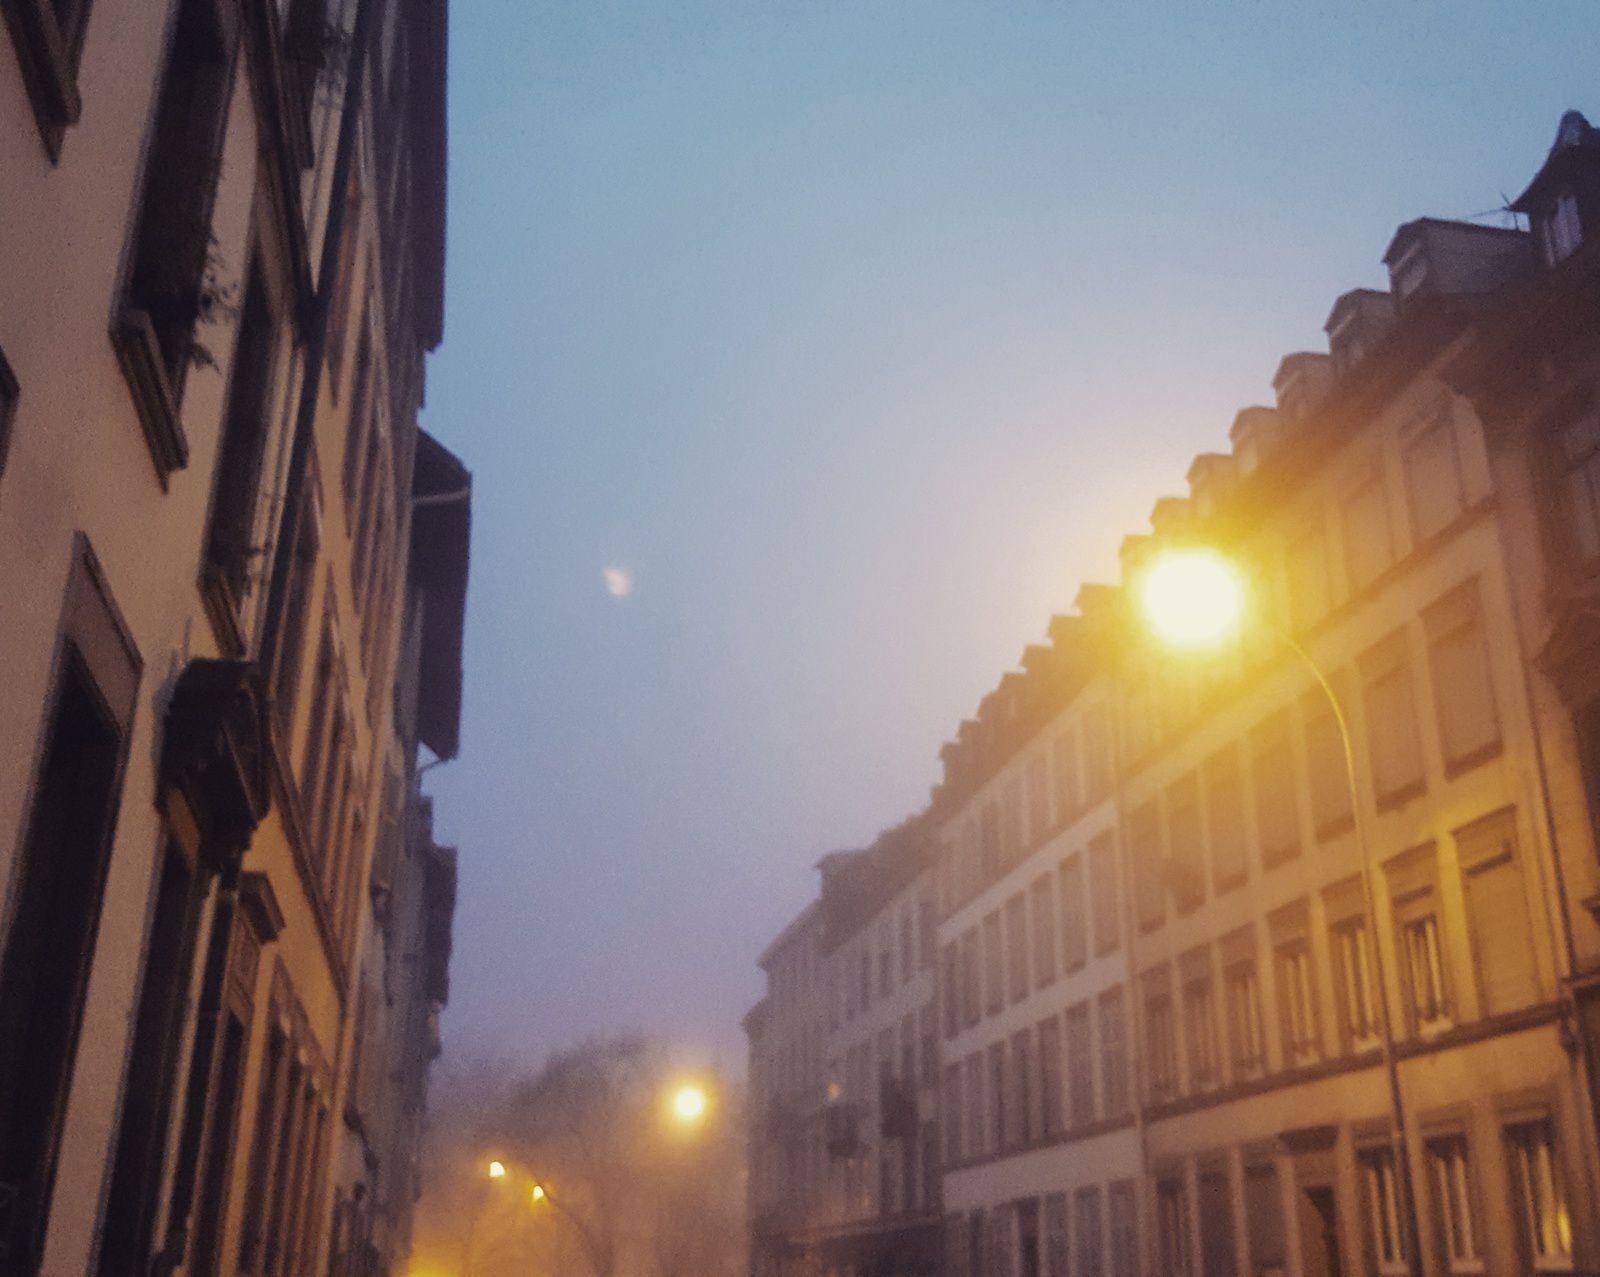 Sortie du bureau sous le brouillard...